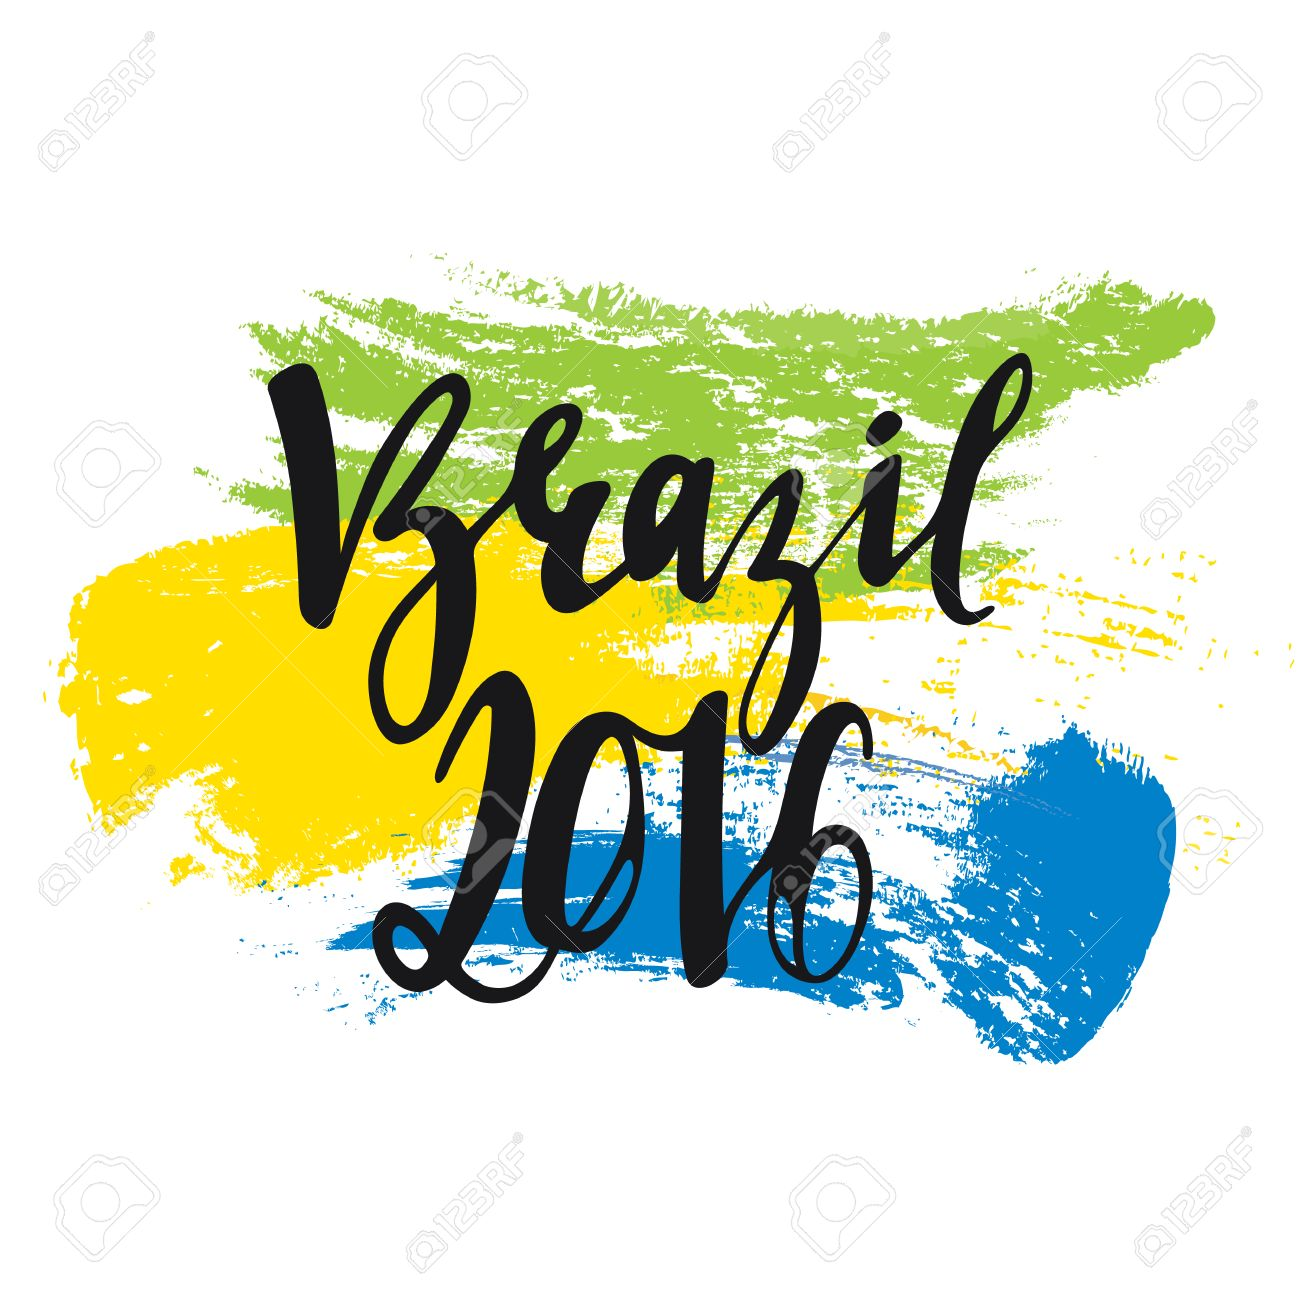 Handmade watercolor brazil flag brasil stock photos freeimages com - Inscription Brazil 2016 Background Colors Of The Brazilian Flag Calligraphy Handmade Greeting Cards